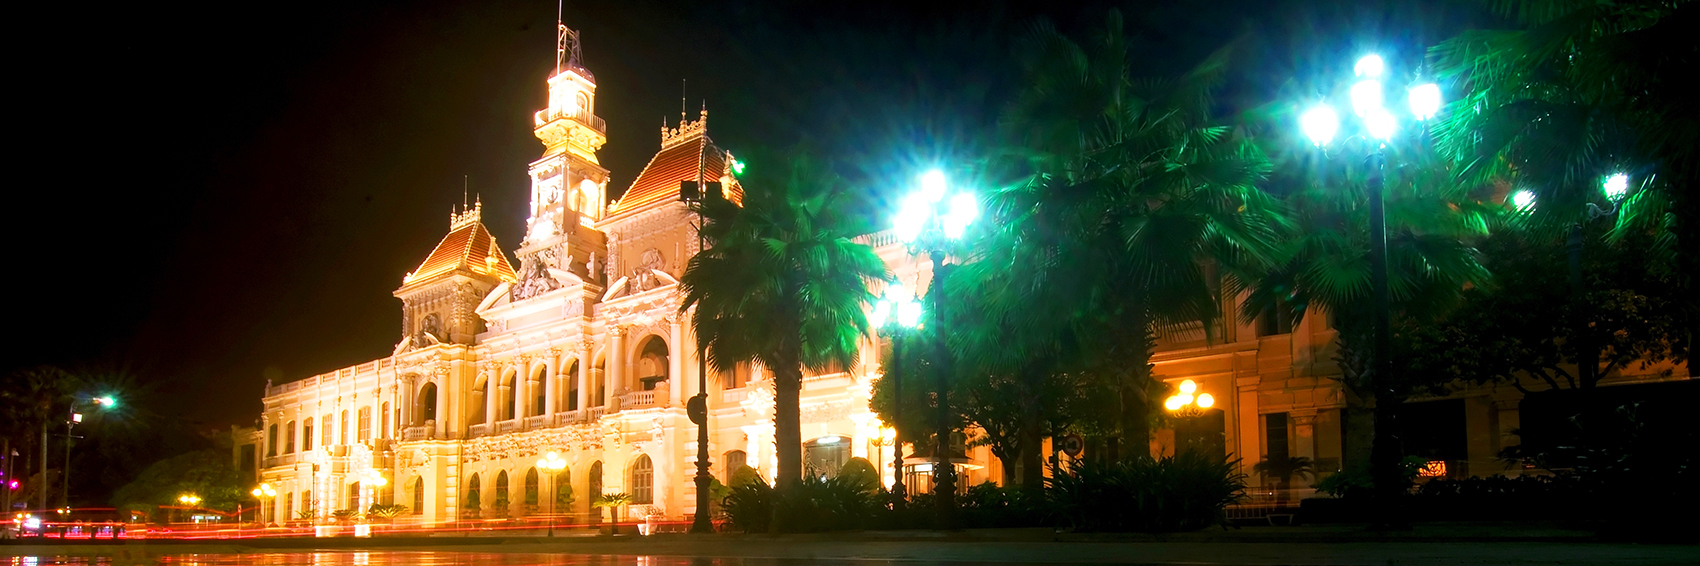 Royal Lotus - Hô Chi Minh Ville